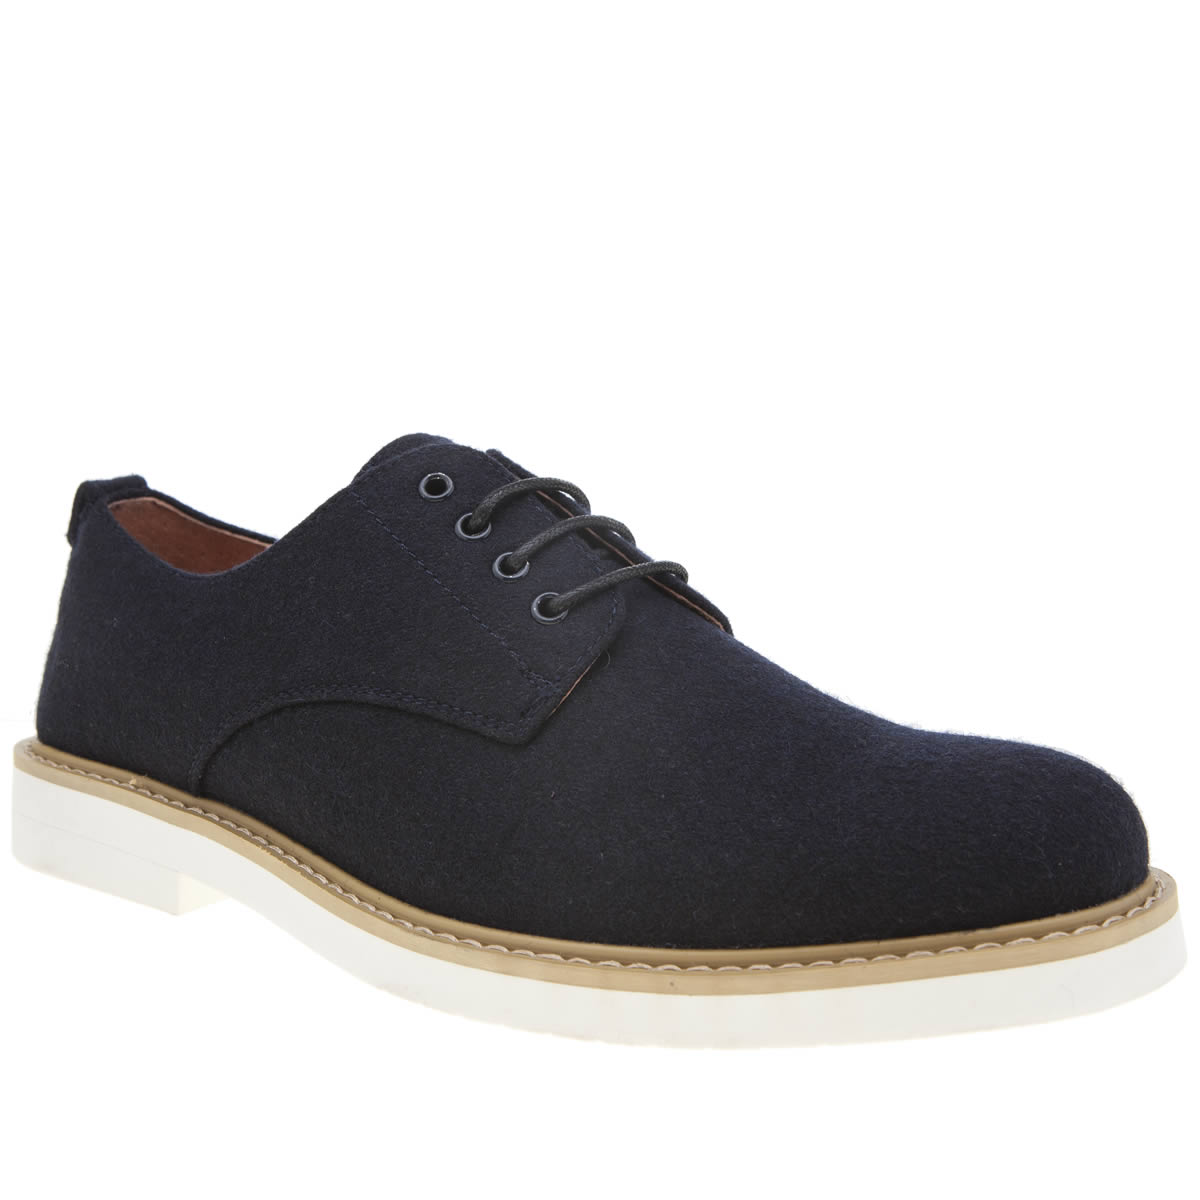 Peter Werth Peter Werth Navy Melton Derby Shoes